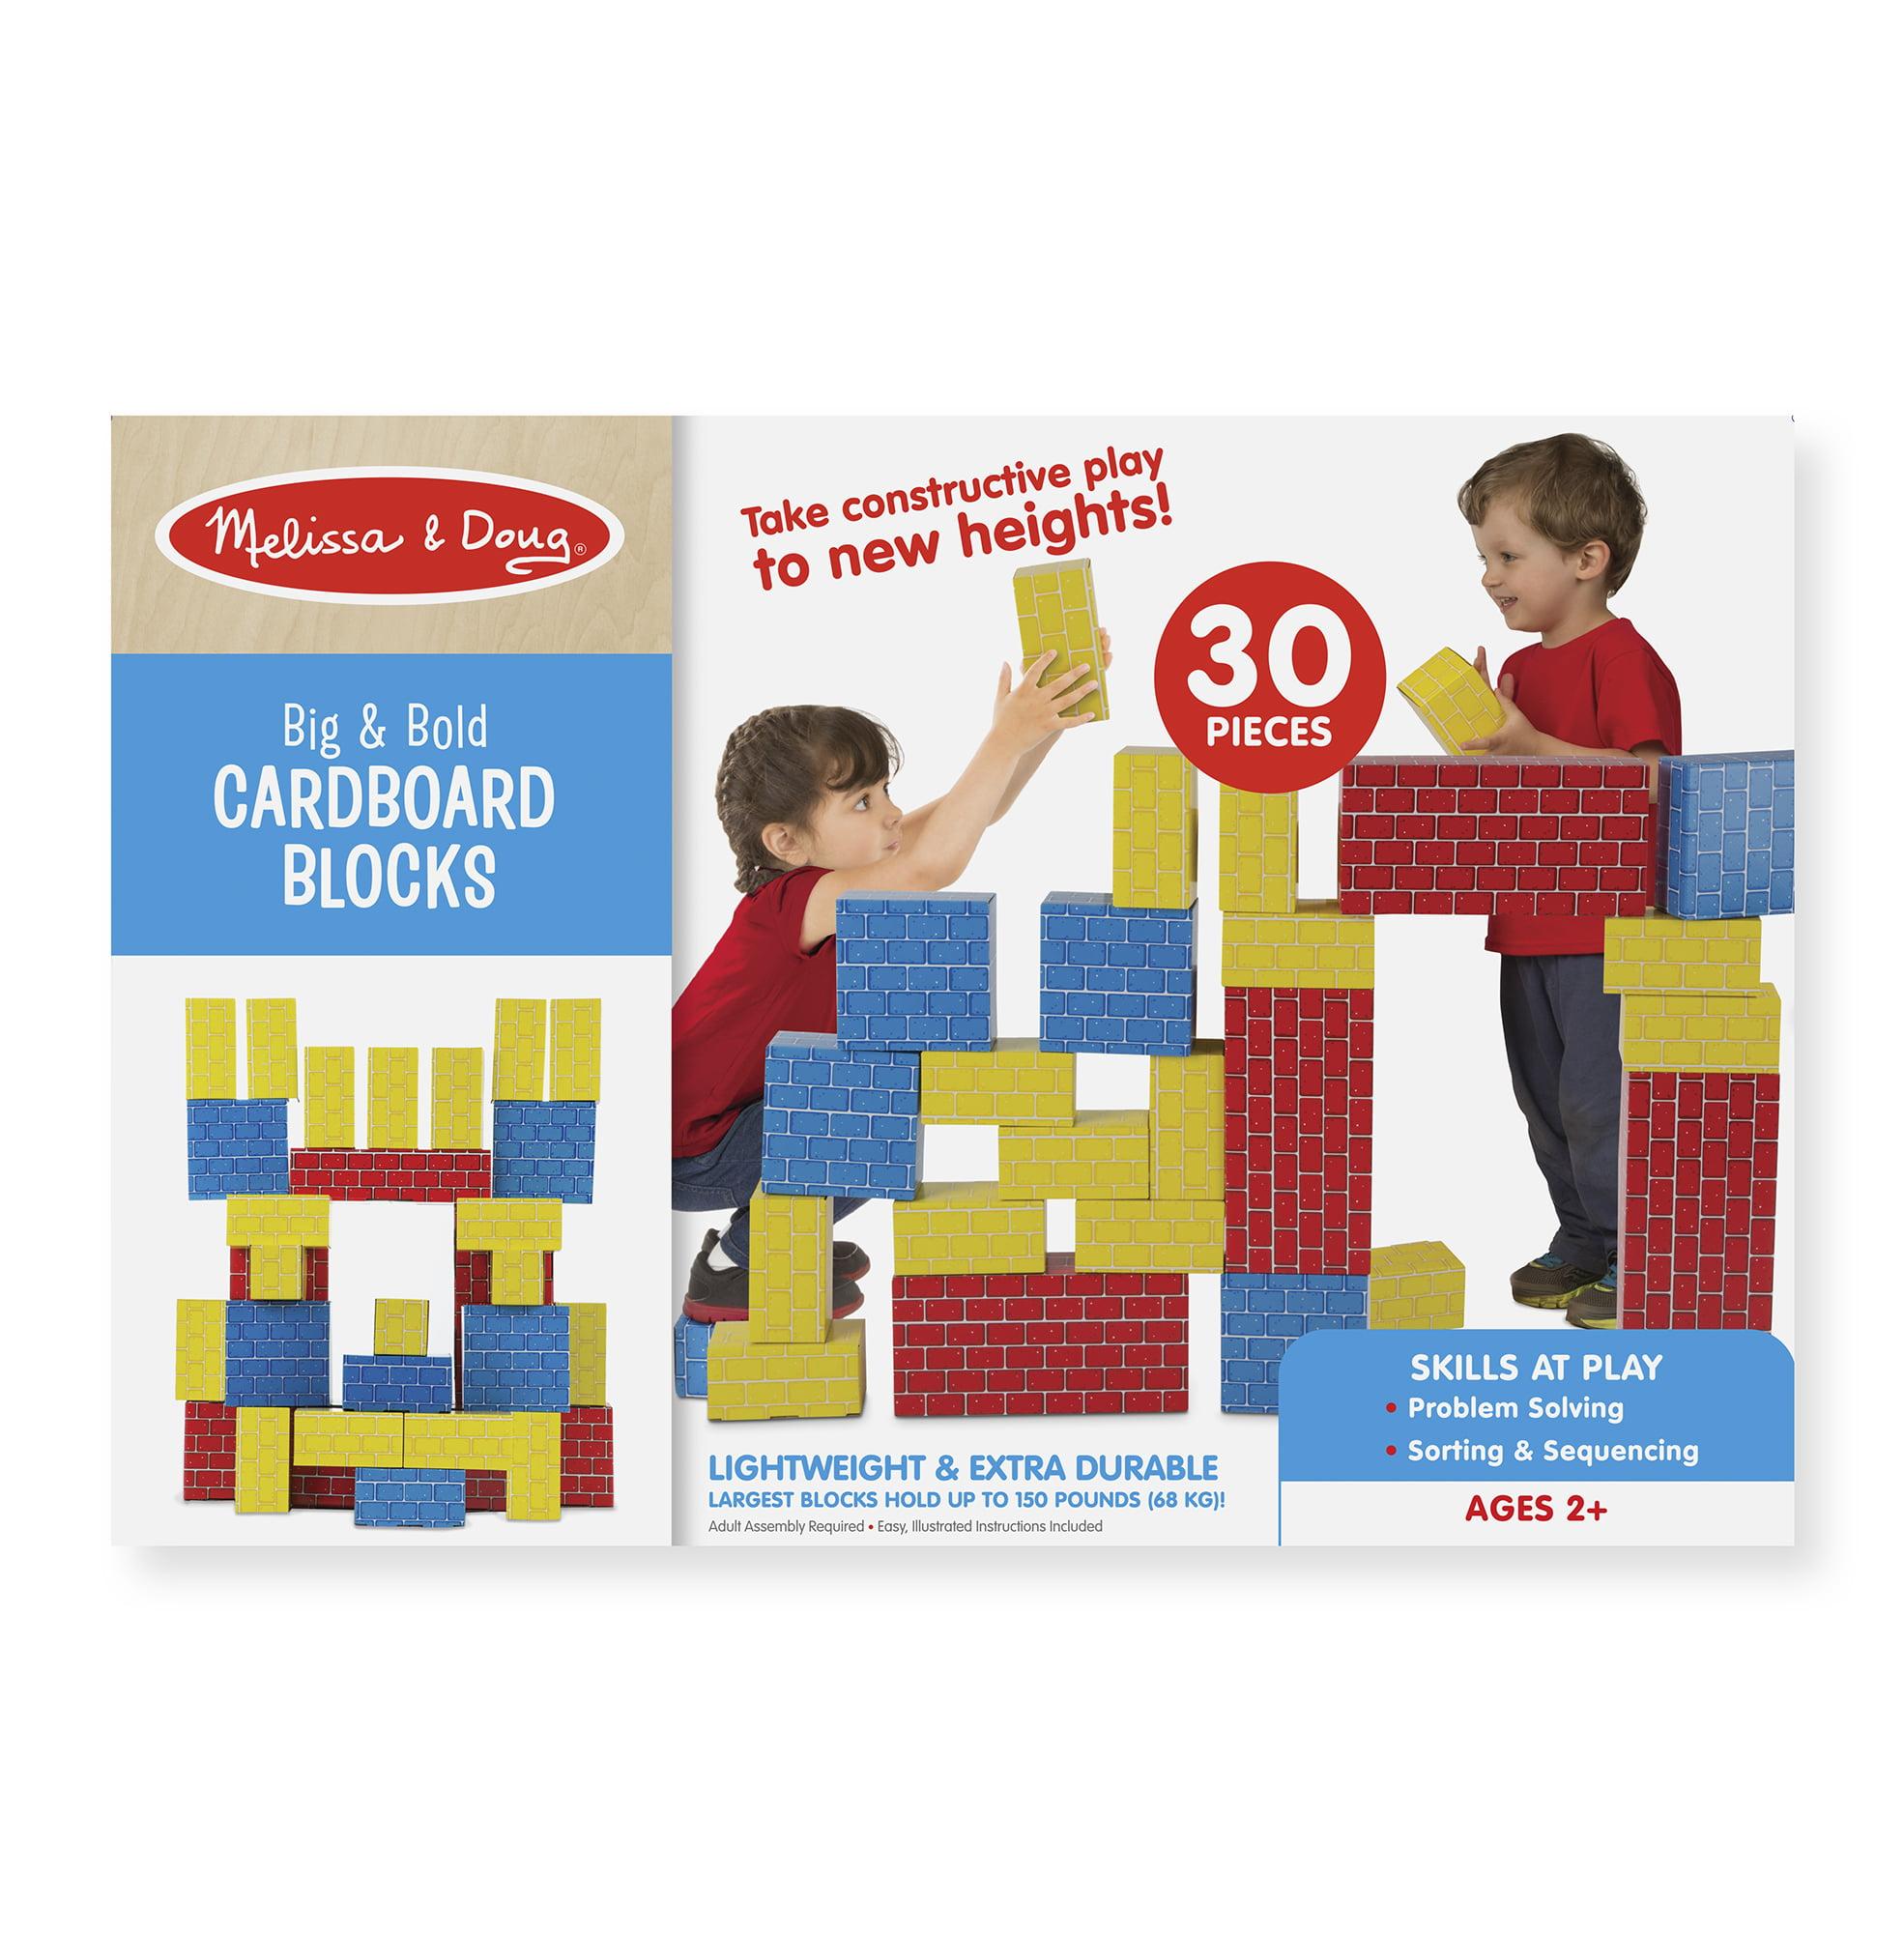 Melissa & Doug 30 Giant Cardboard Building Blocks by Melissa & Doug